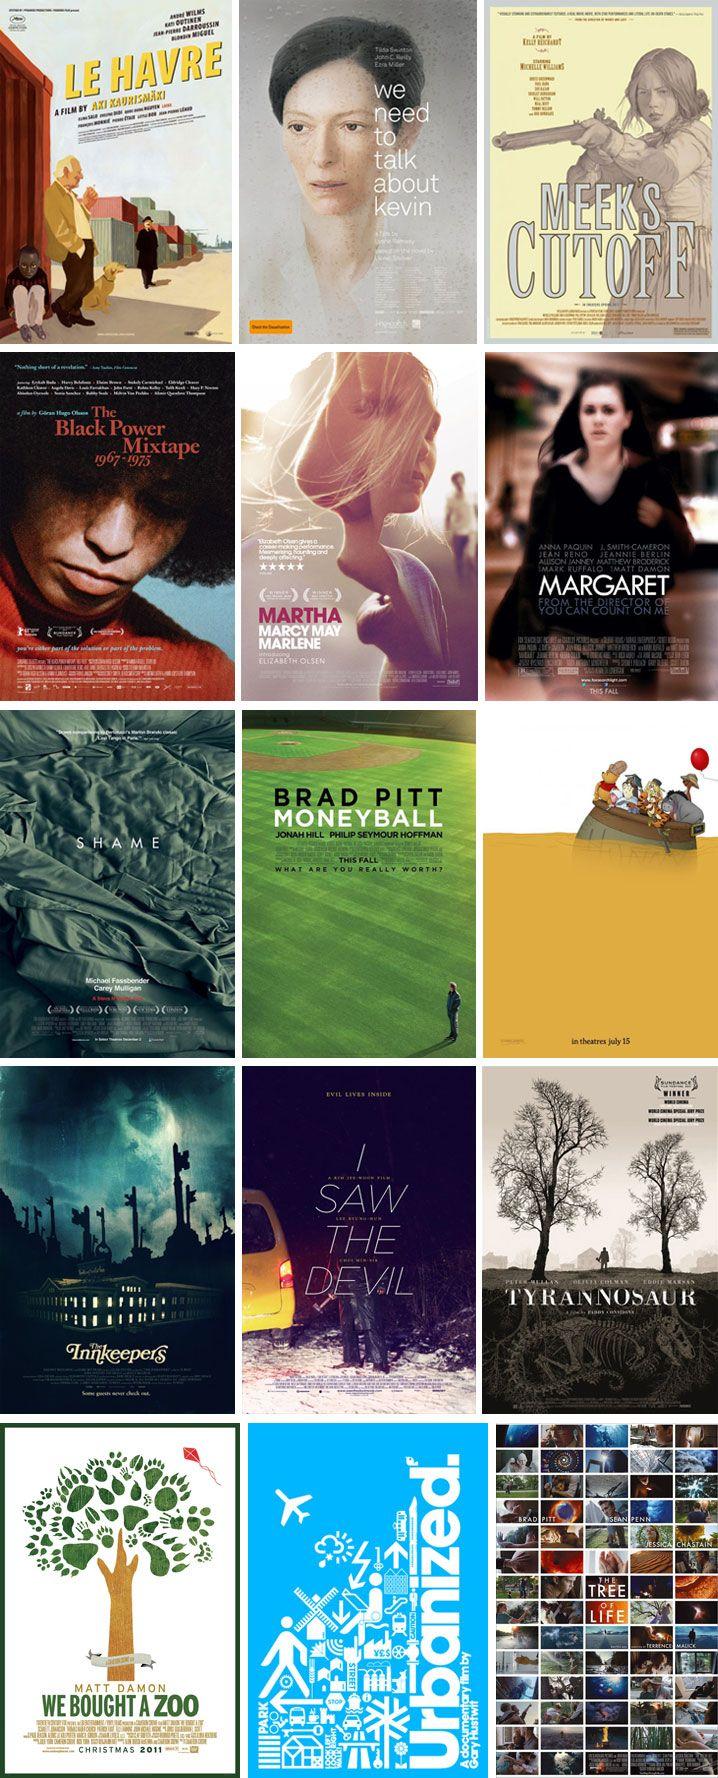 International cinema clips website 01 11 - Best Movie Posters Of 2011 Via Notebook The Digital Magazine Of International Cinema And Film